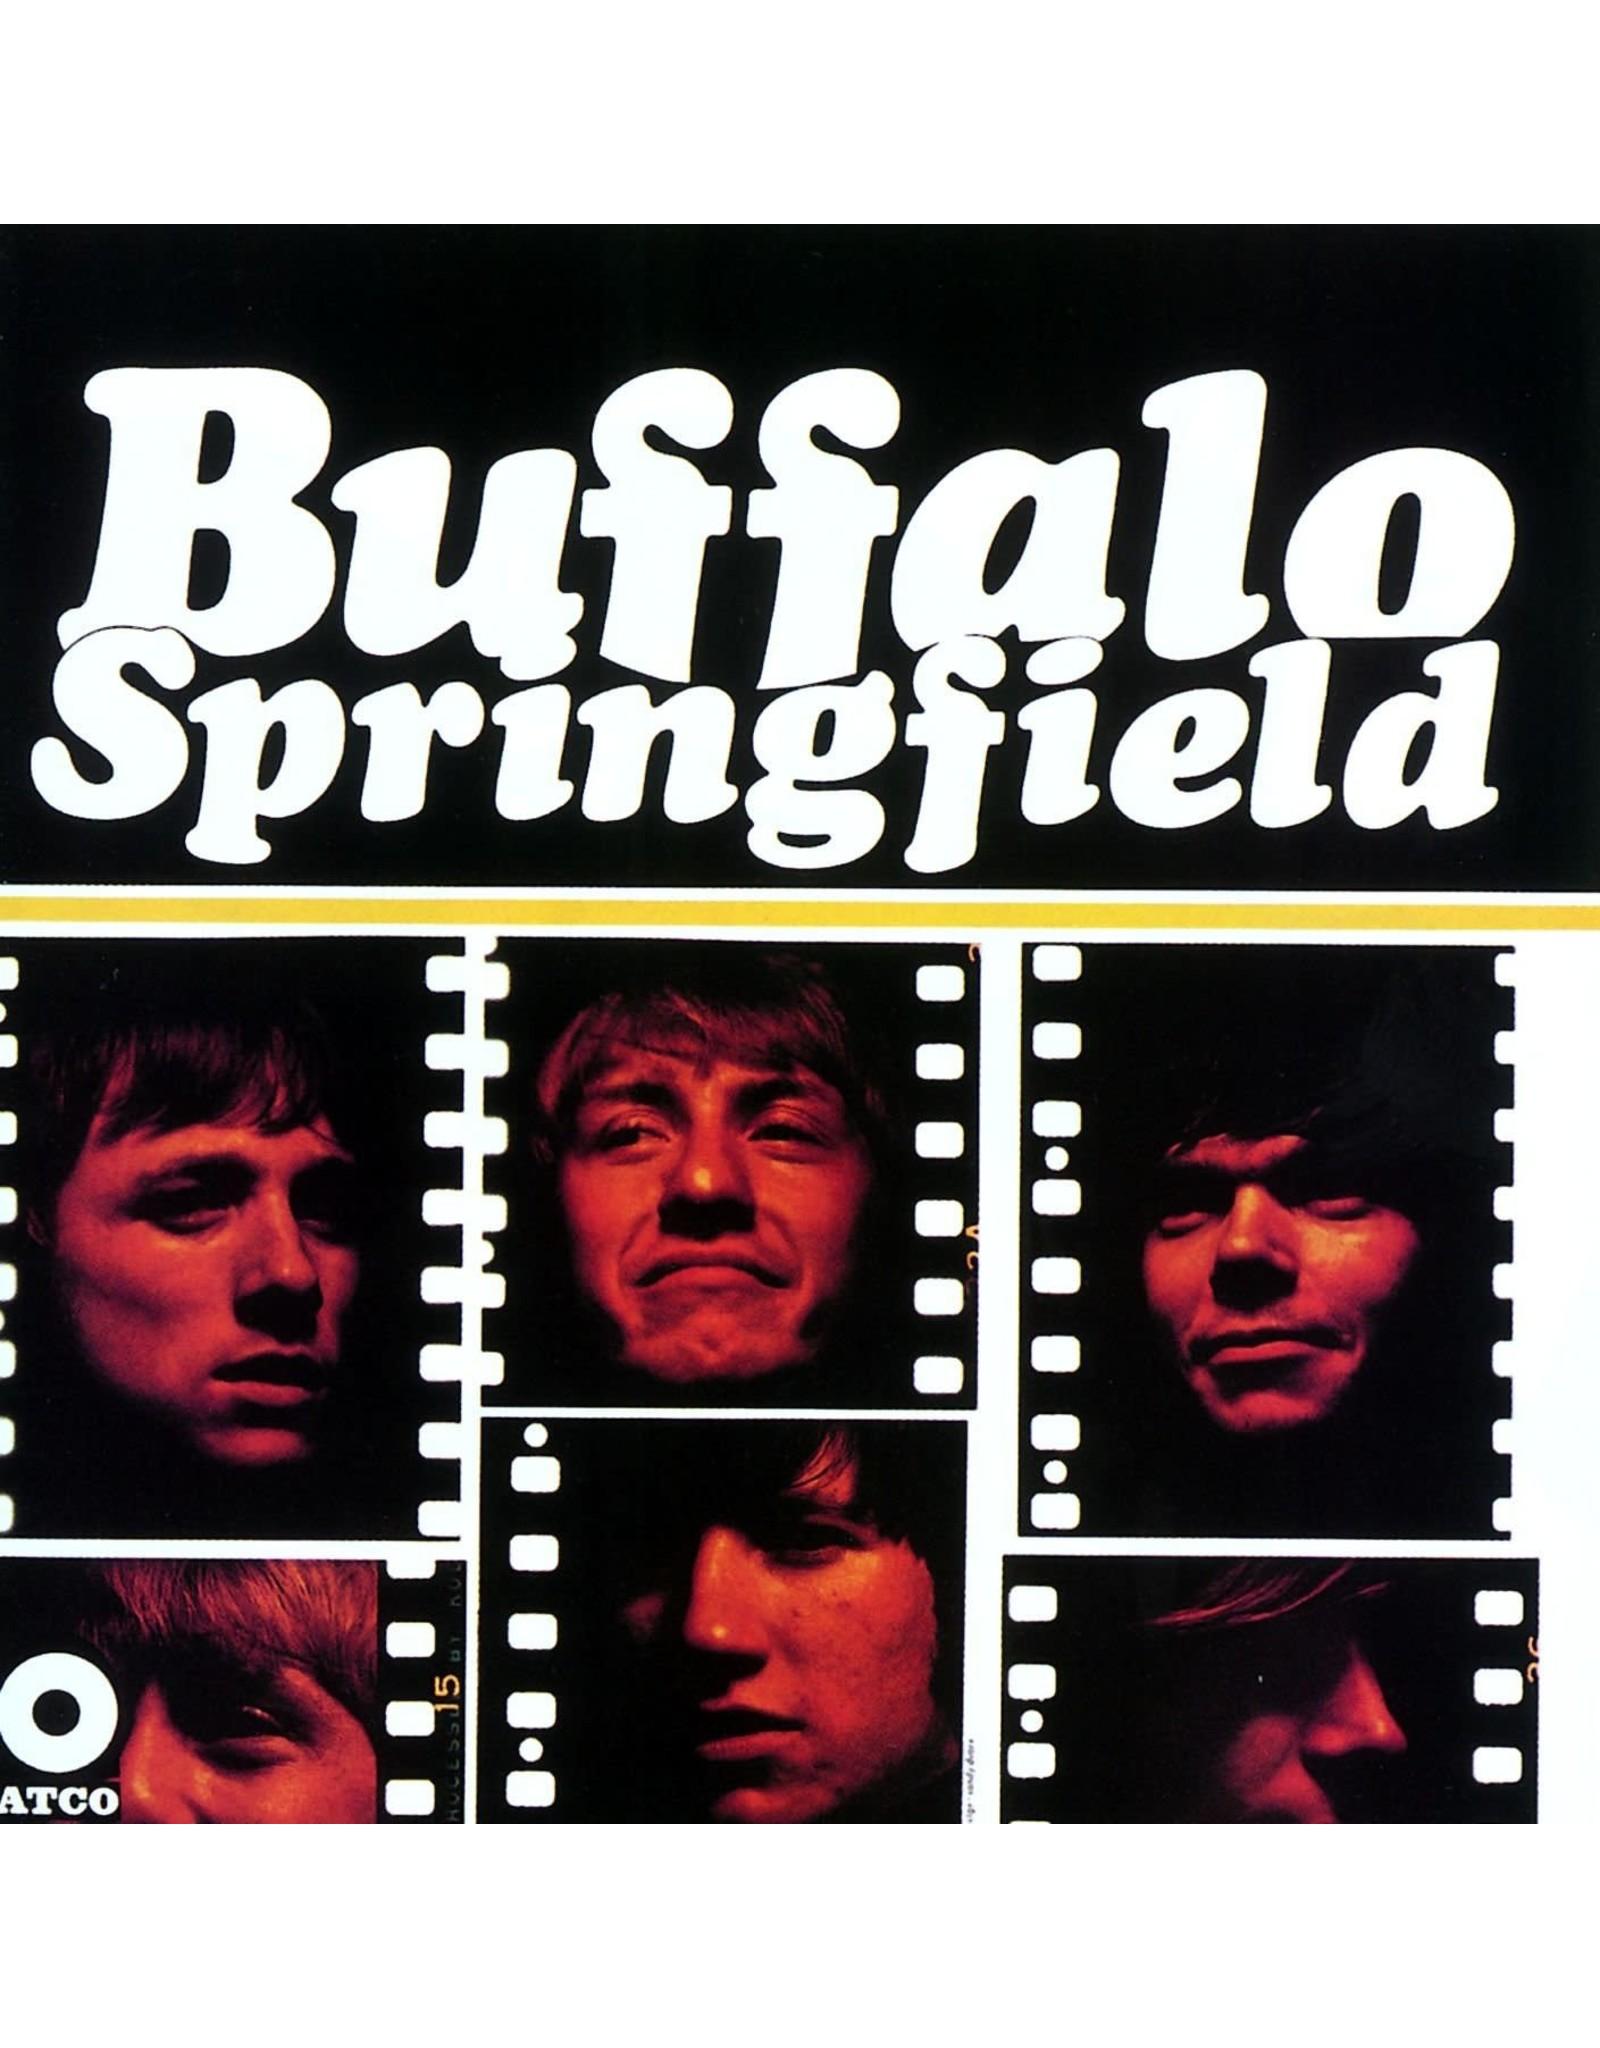 Buffalo Springfield - S/T LP (180g Vinyl/Mono Version)